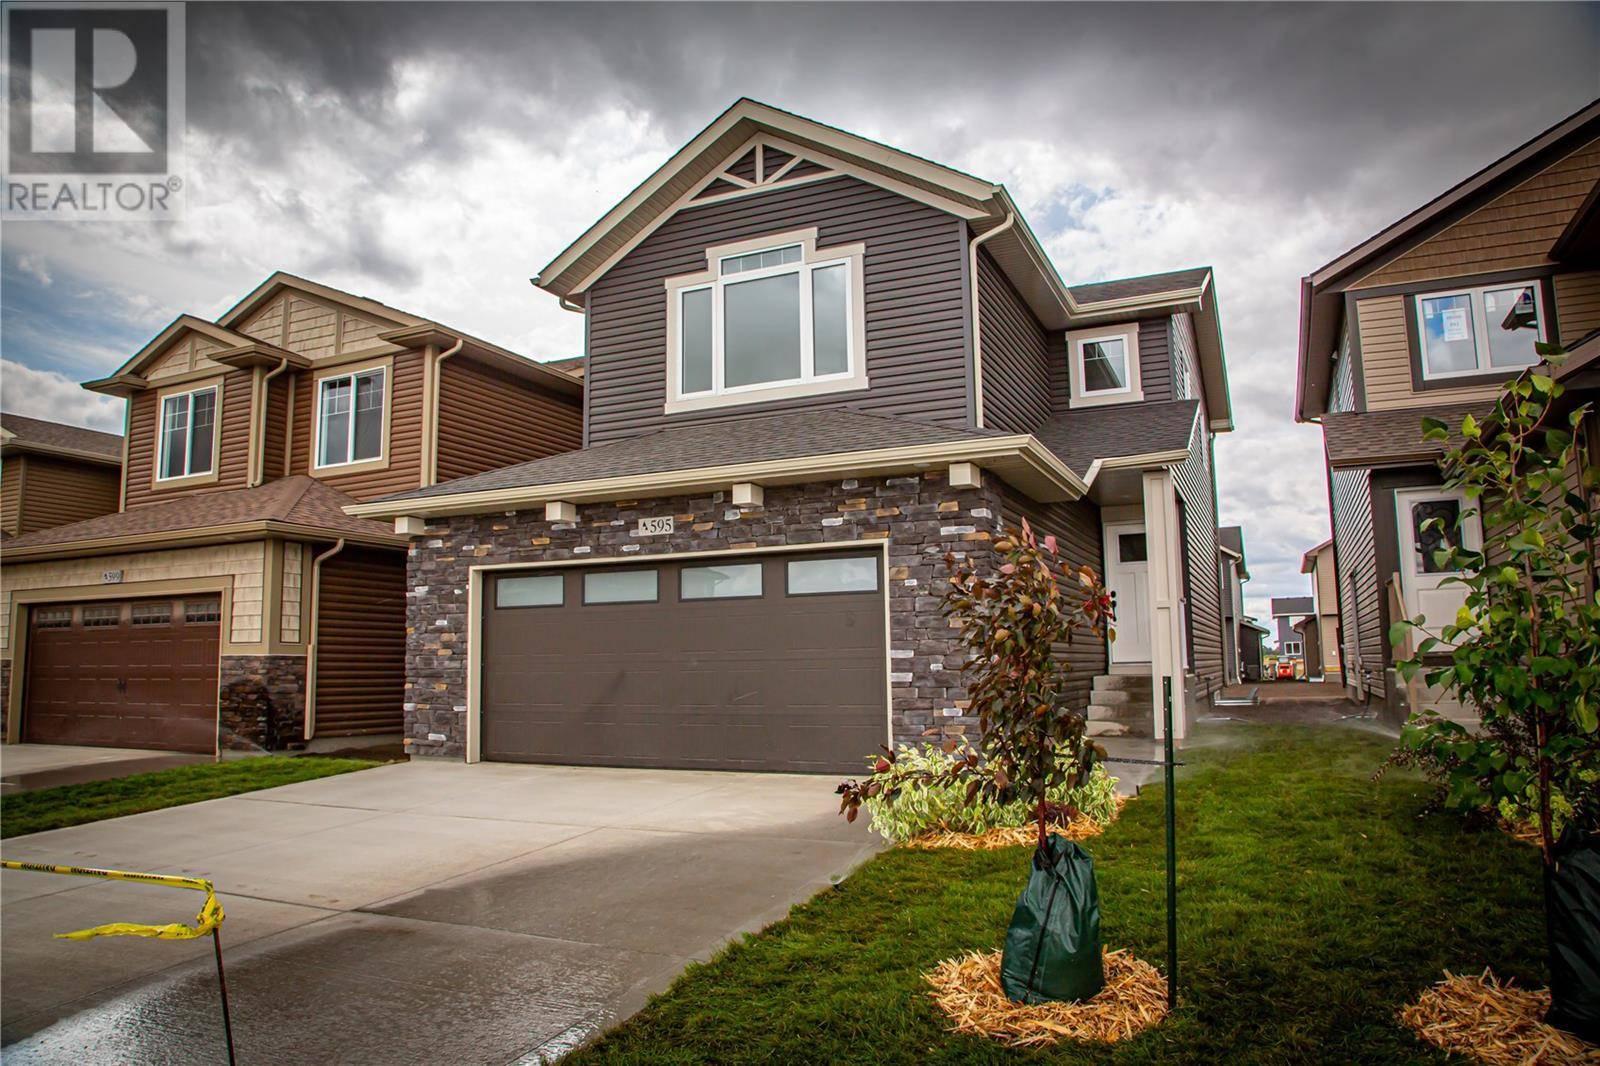 House for sale at 595 Mcfaull Cres Saskatoon Saskatchewan - MLS: SK771989